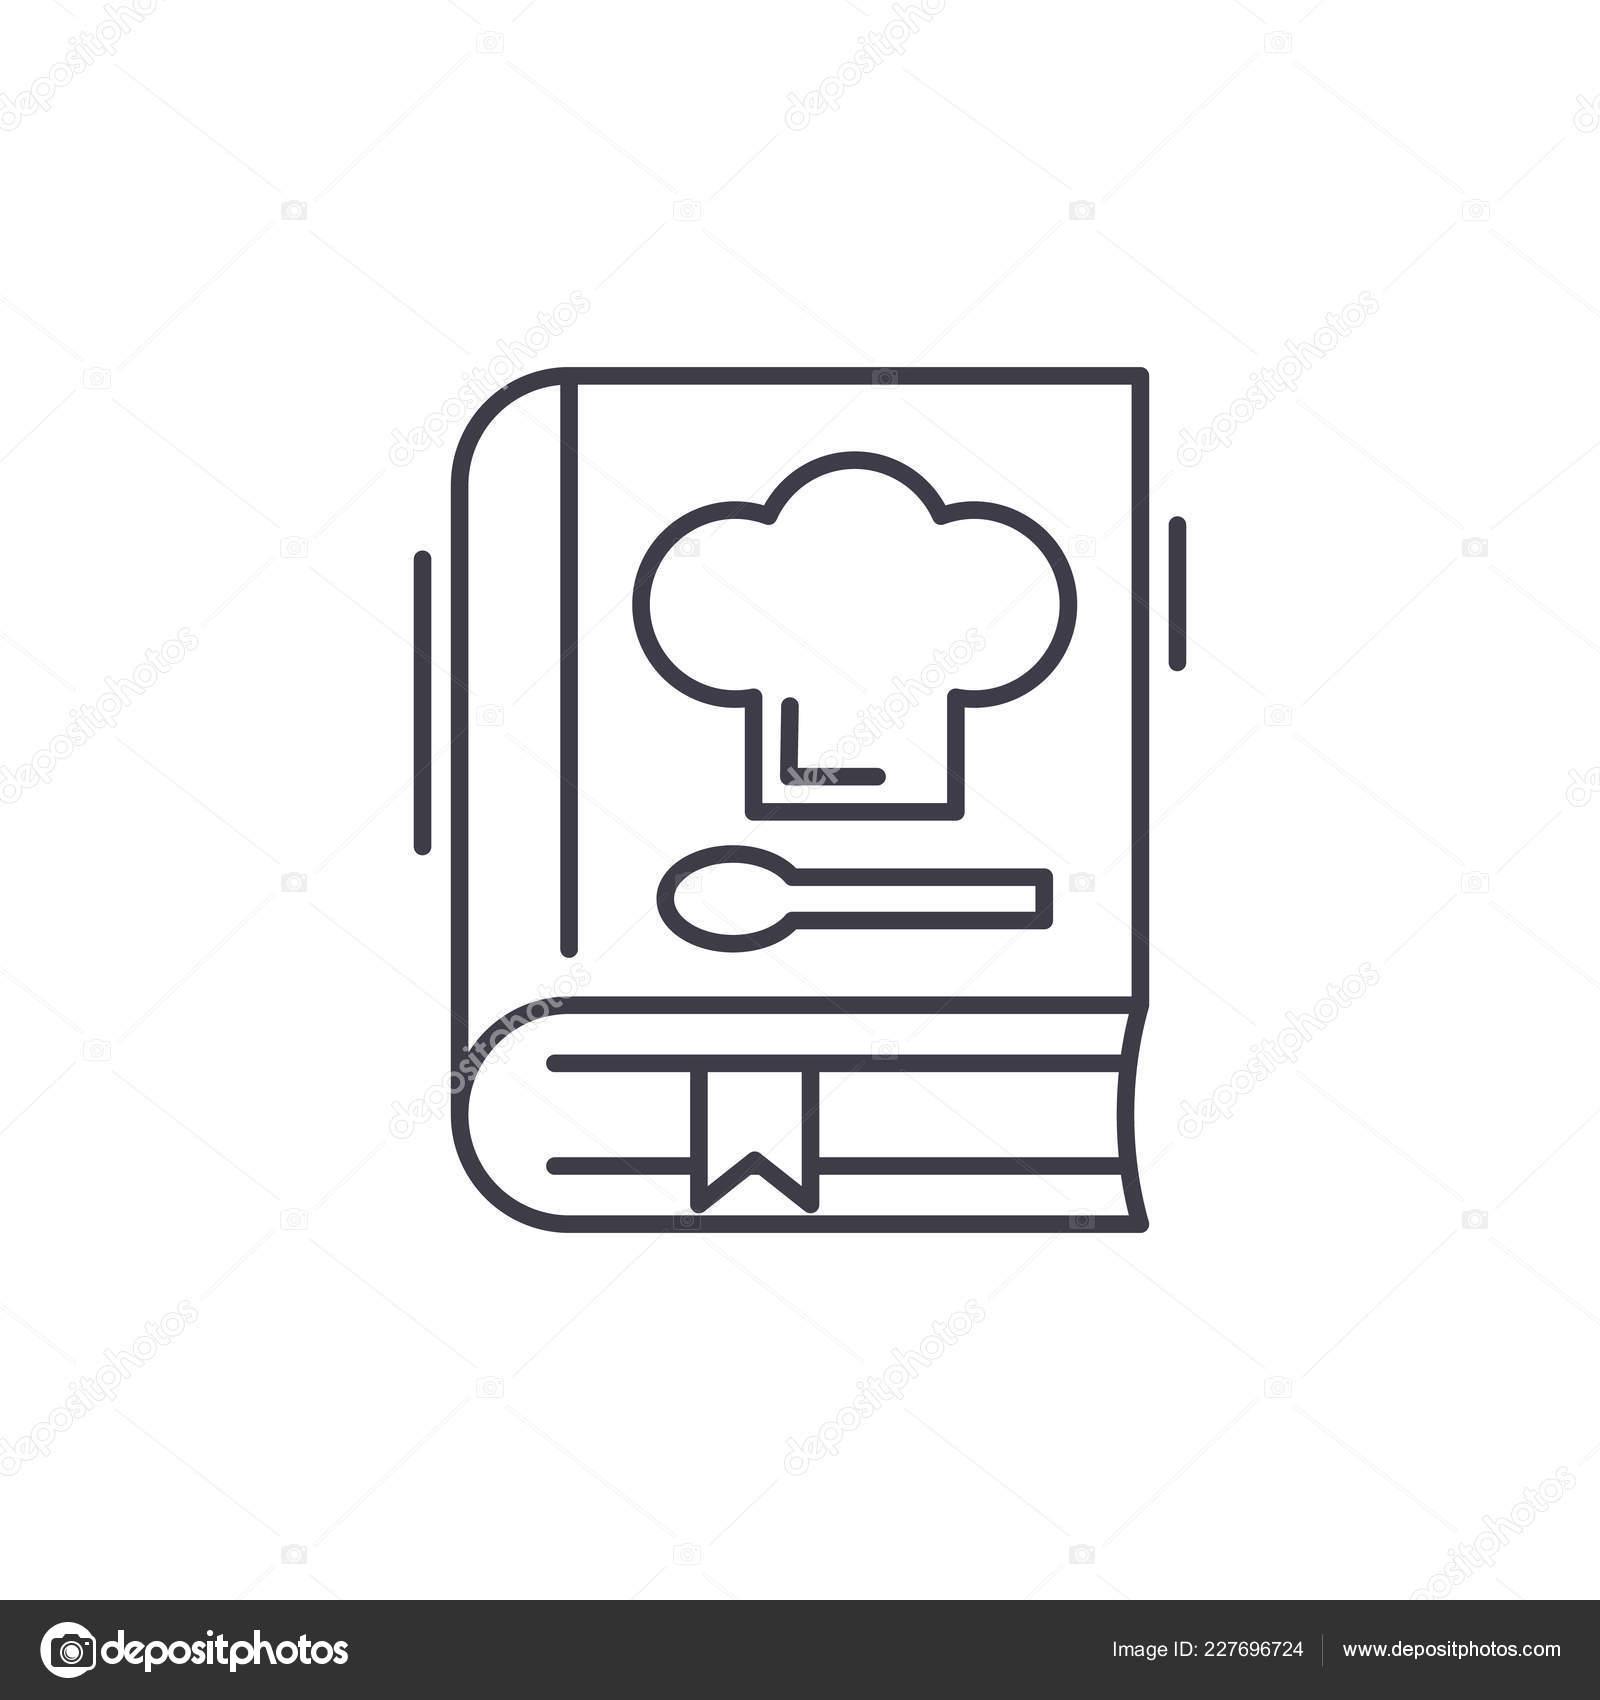 Book of recipes line icon concept. Book of recipes vector